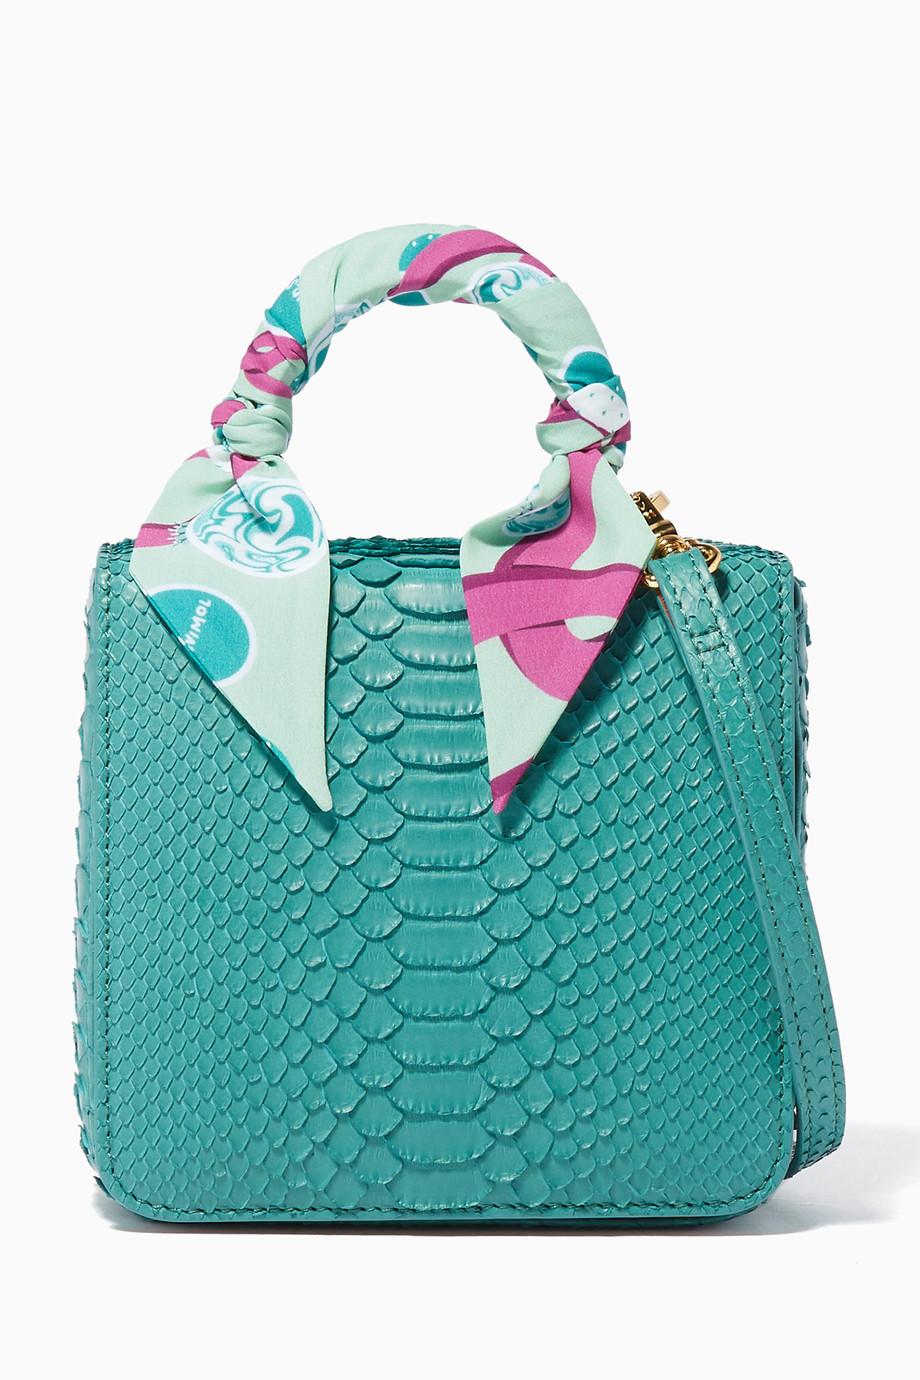 88477ca2fa4 Shop S'uvimol Green Green Python Square F Baby Top Handle Bag for ...